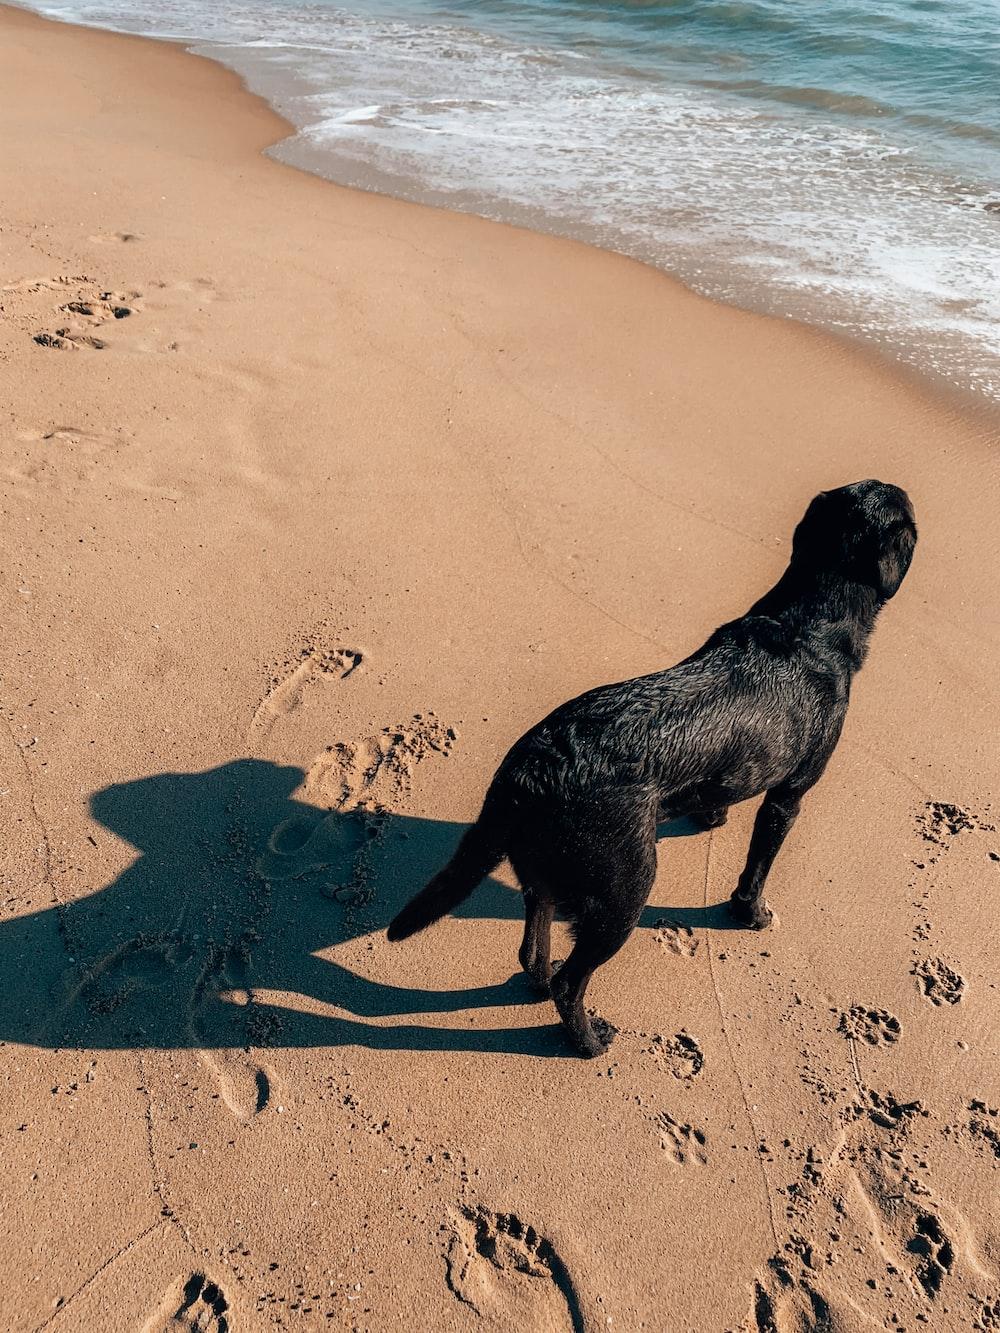 black labrador retriever on beach shore during daytime